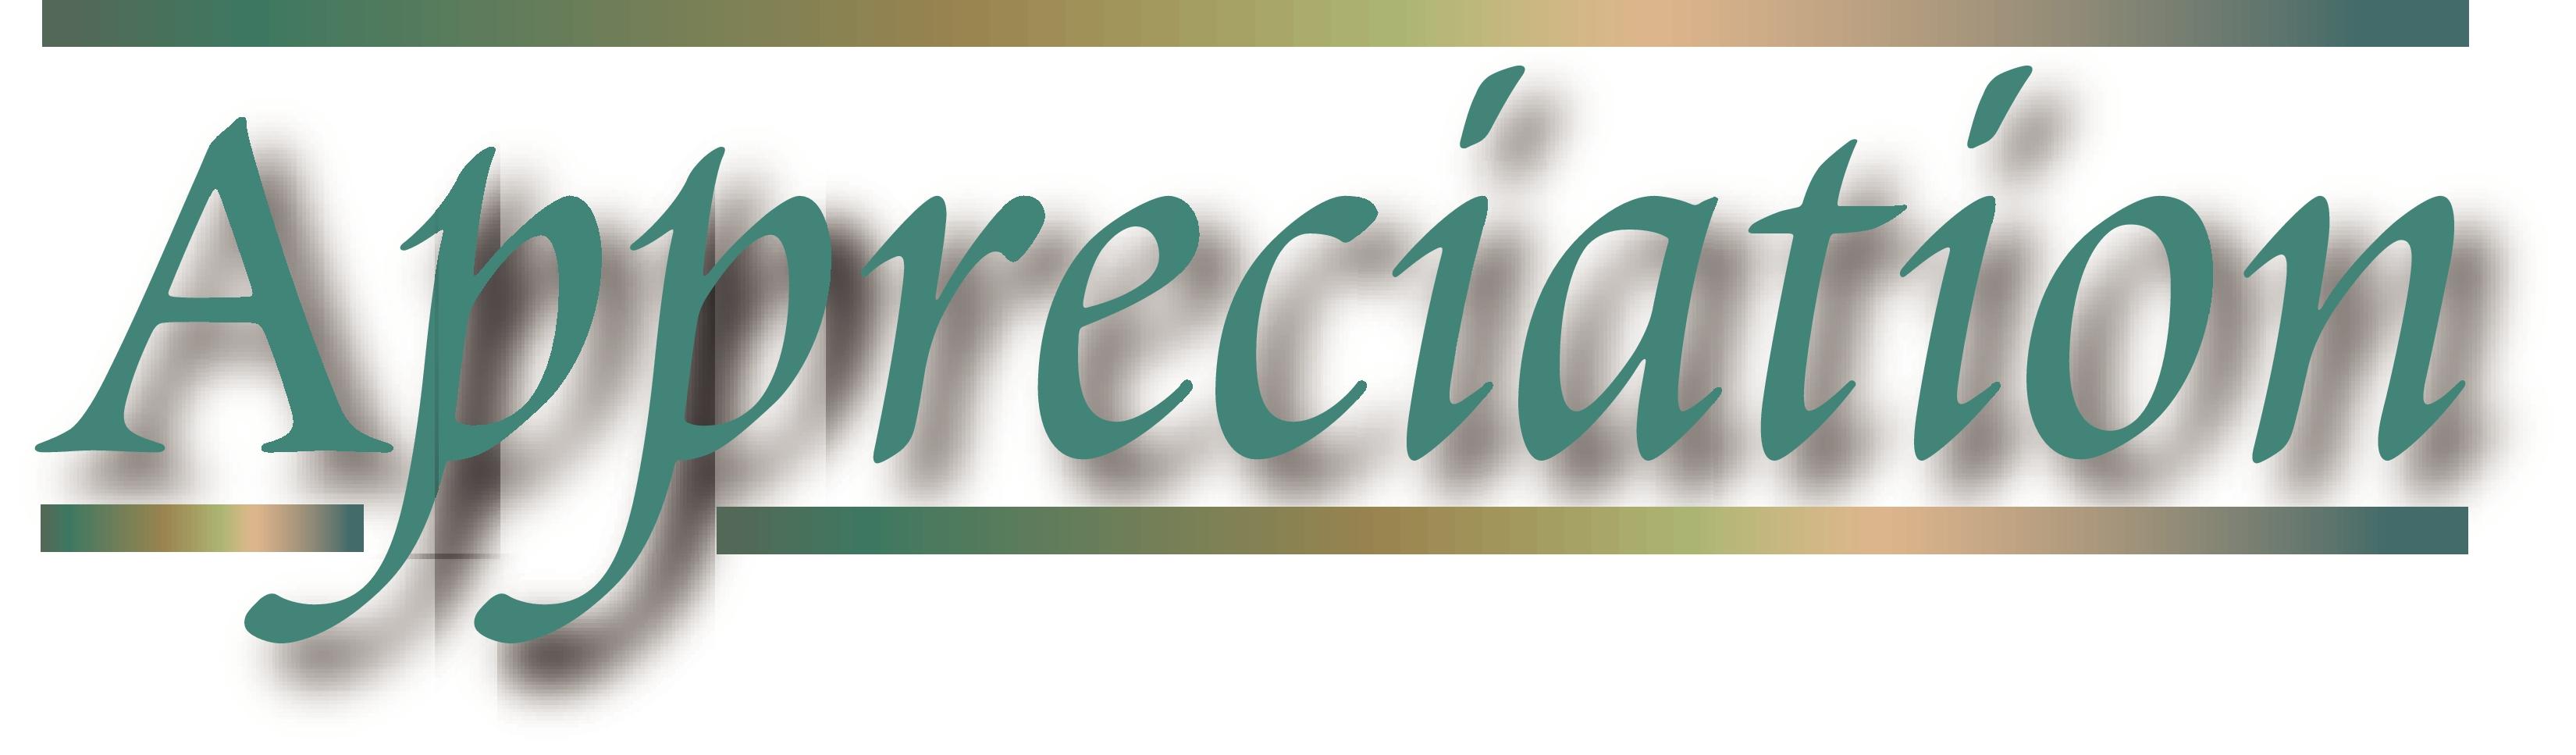 Free Appreciation Cliparts, Download Free Clip Art, Free Clip Art on.